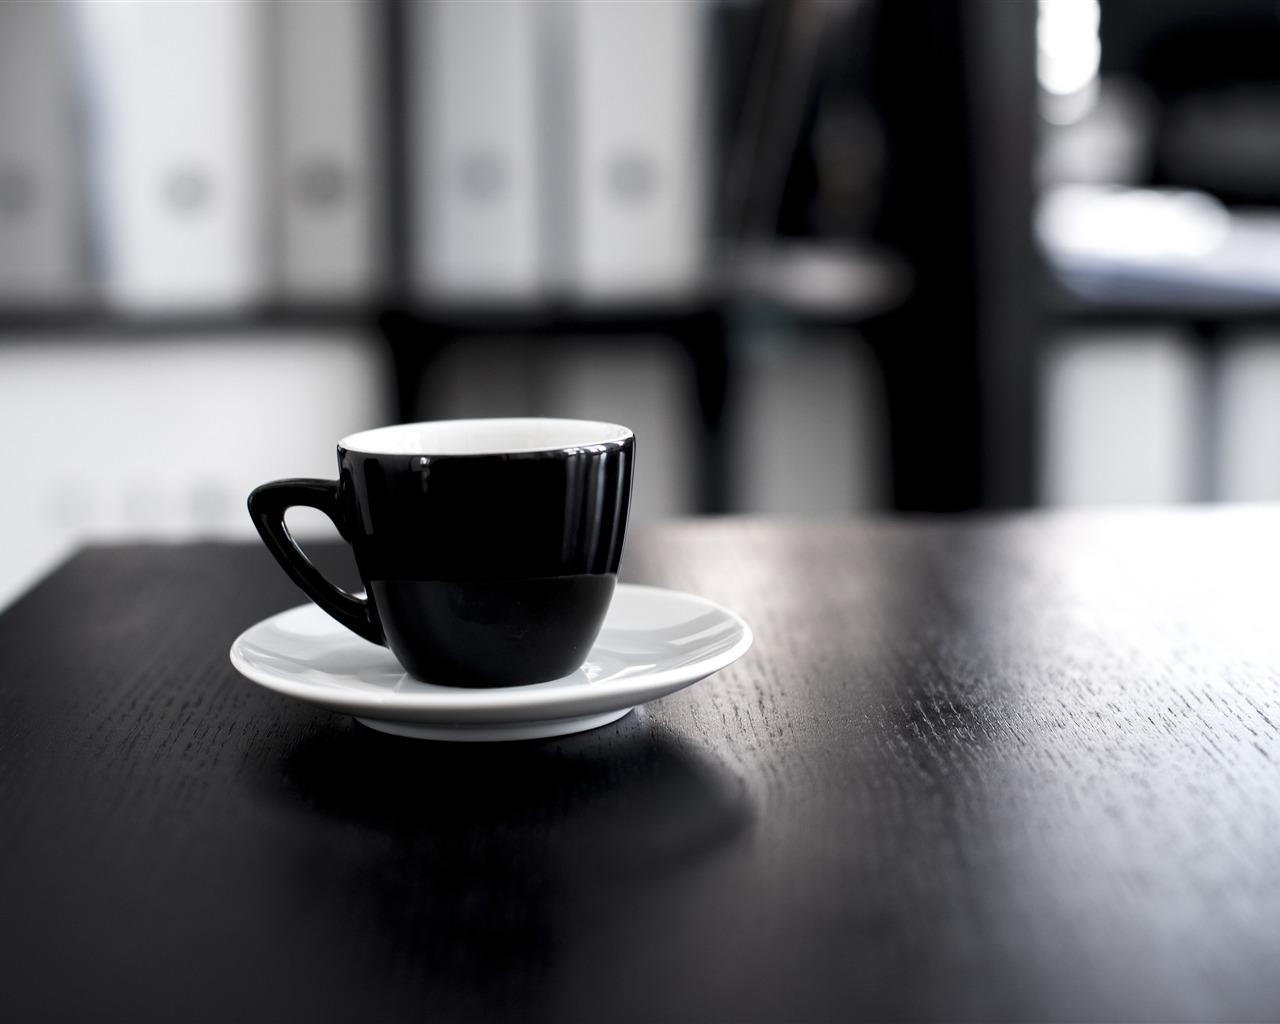 Negro, escritorio, café, blanco taza negra, primer plano Avance |  10wallpaper.com